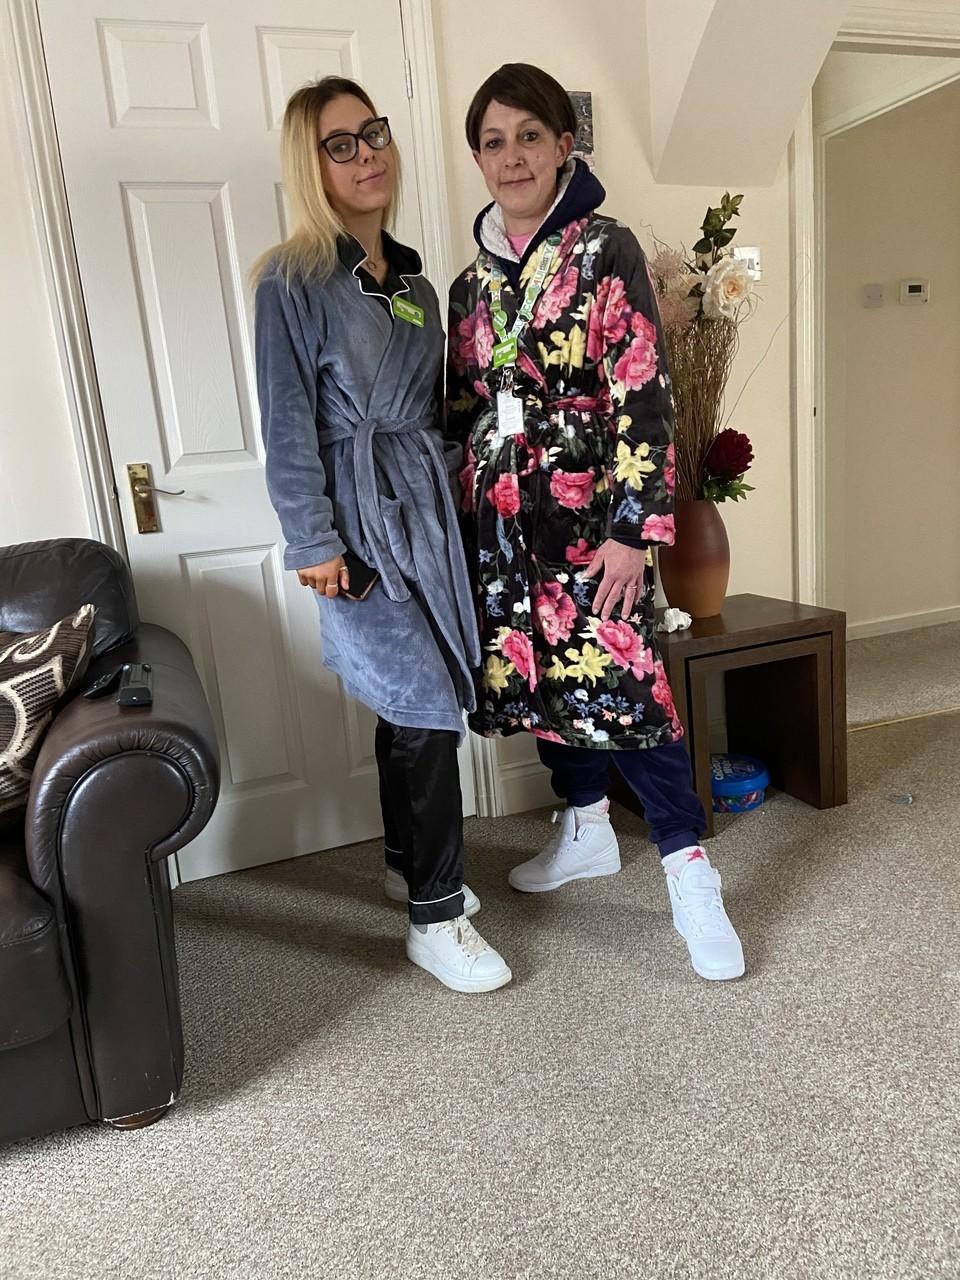 World sleep day = pyjama day @ Asda Biggleswade | Asda Biggleswade